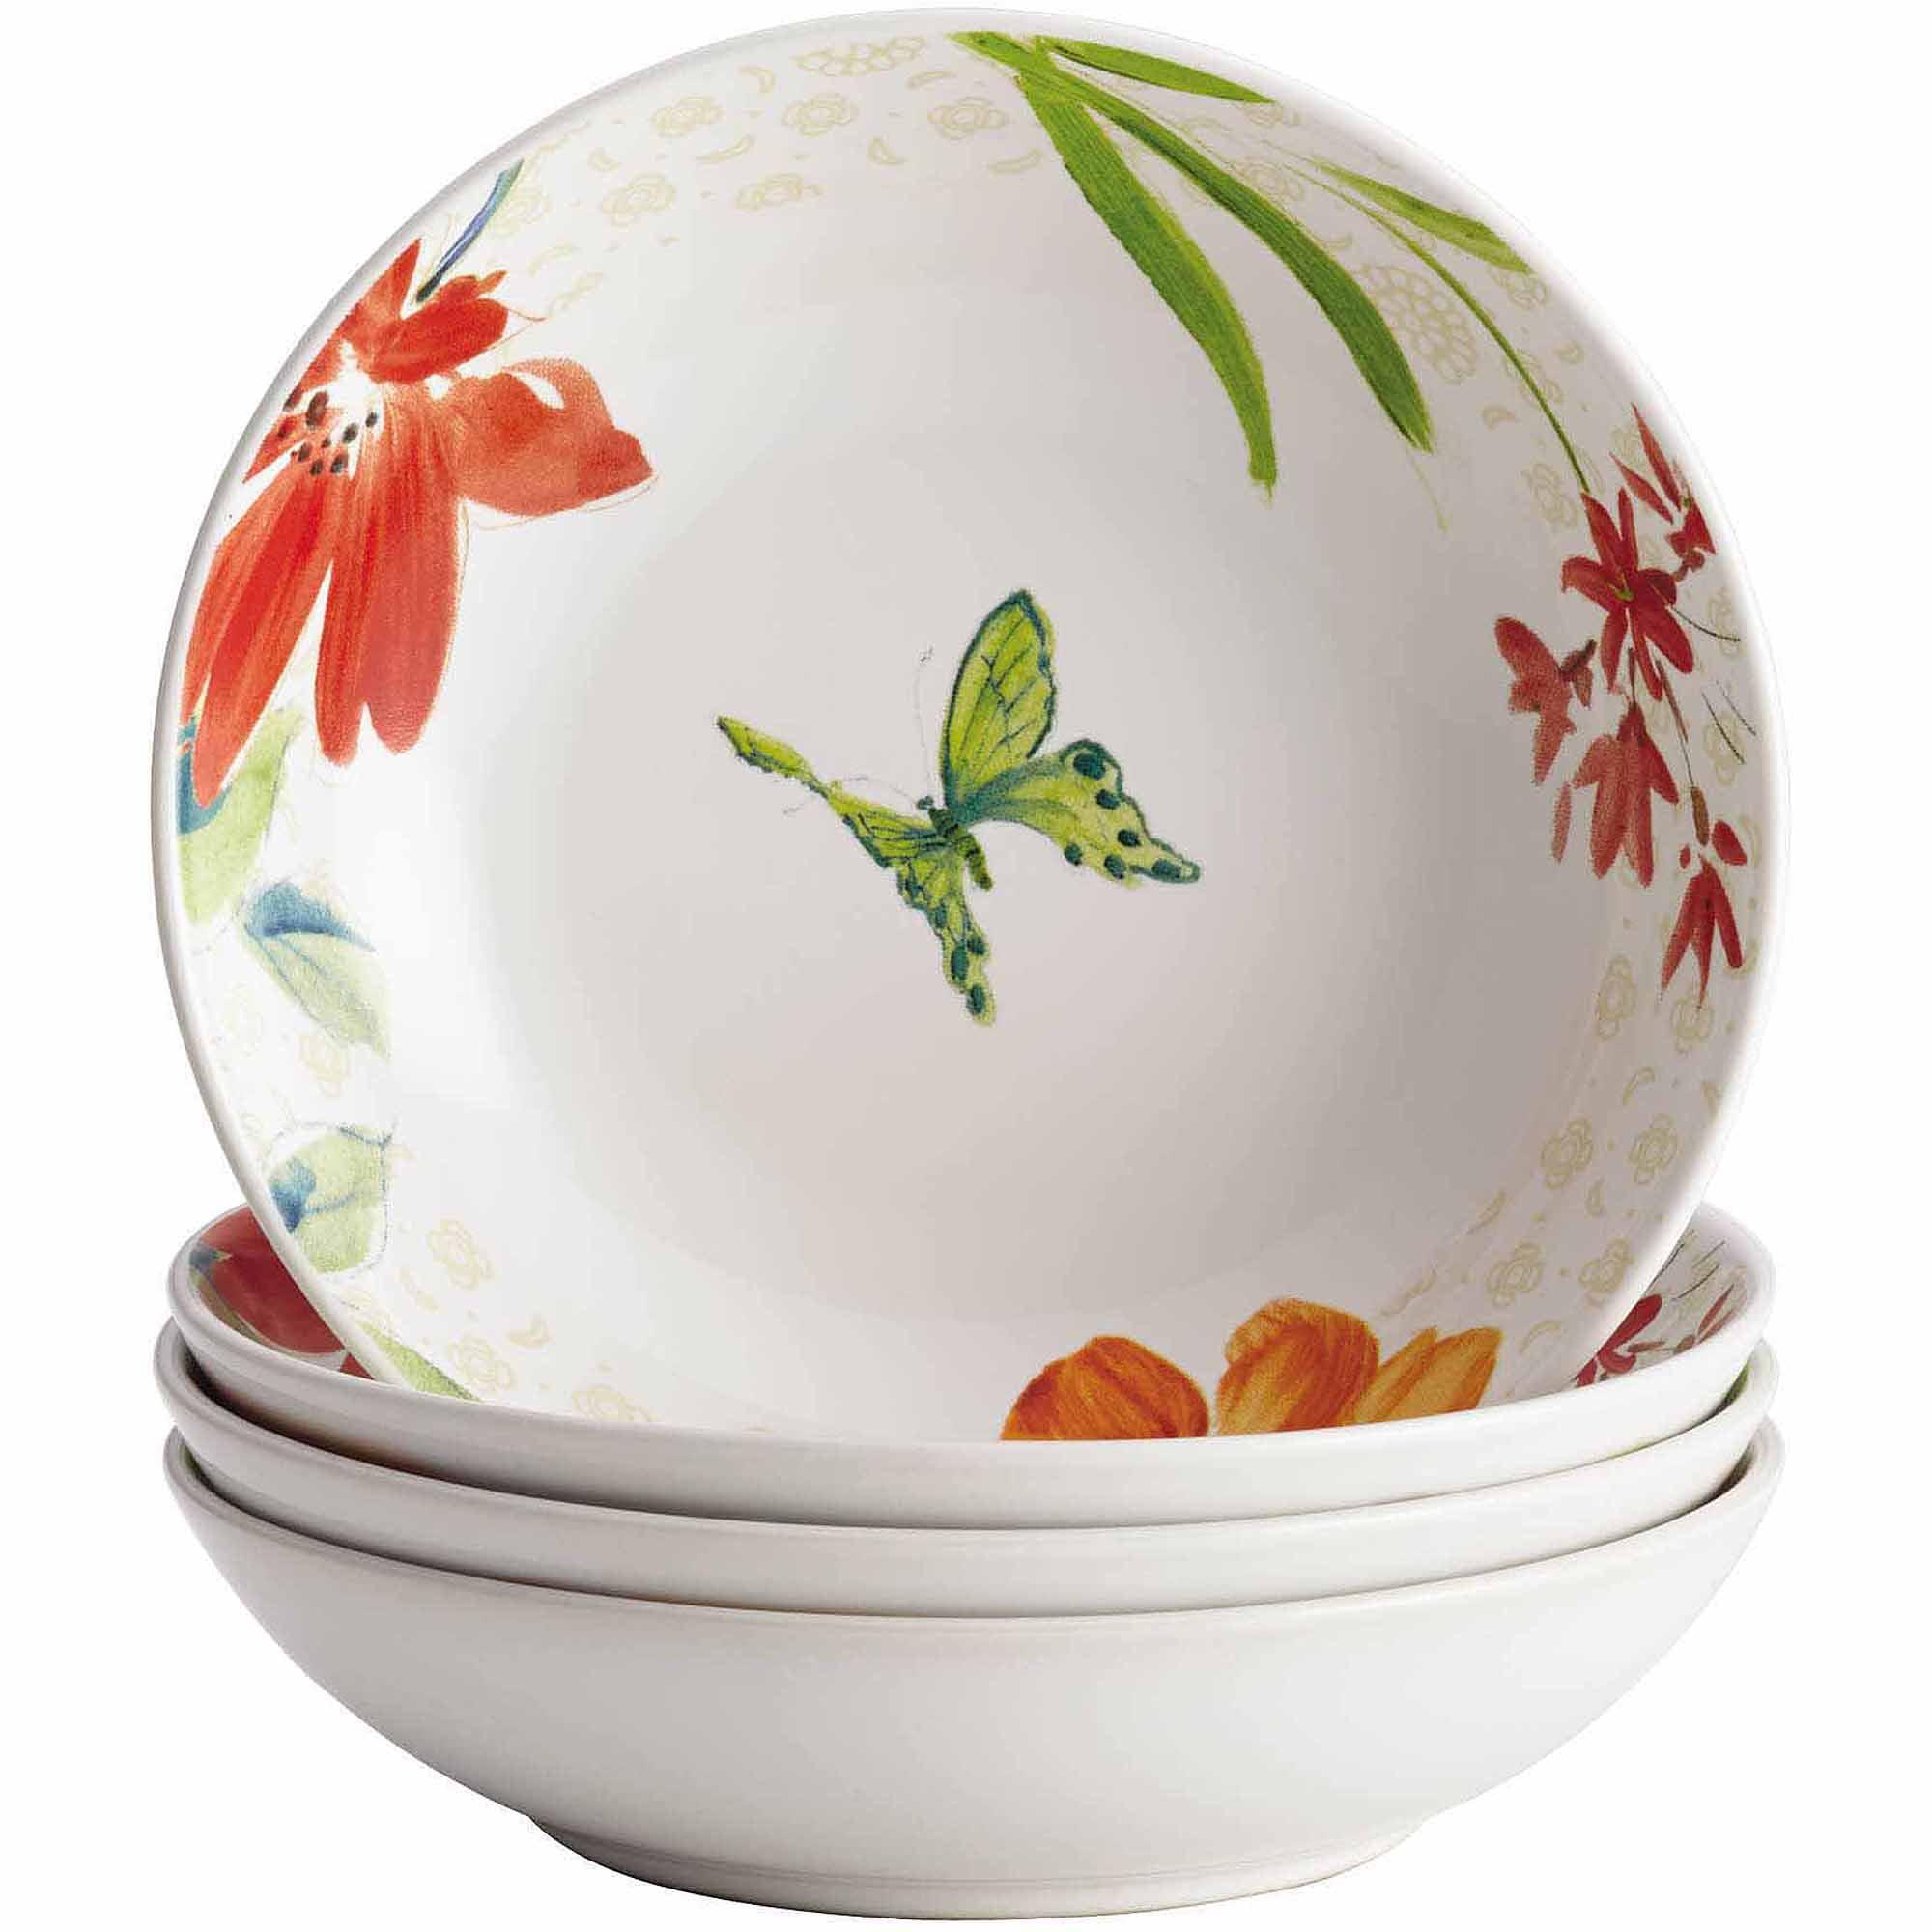 BonJour Dinnerware Al Fresco Porcelain Stoneware 4-Piece Fruit Bowl Set